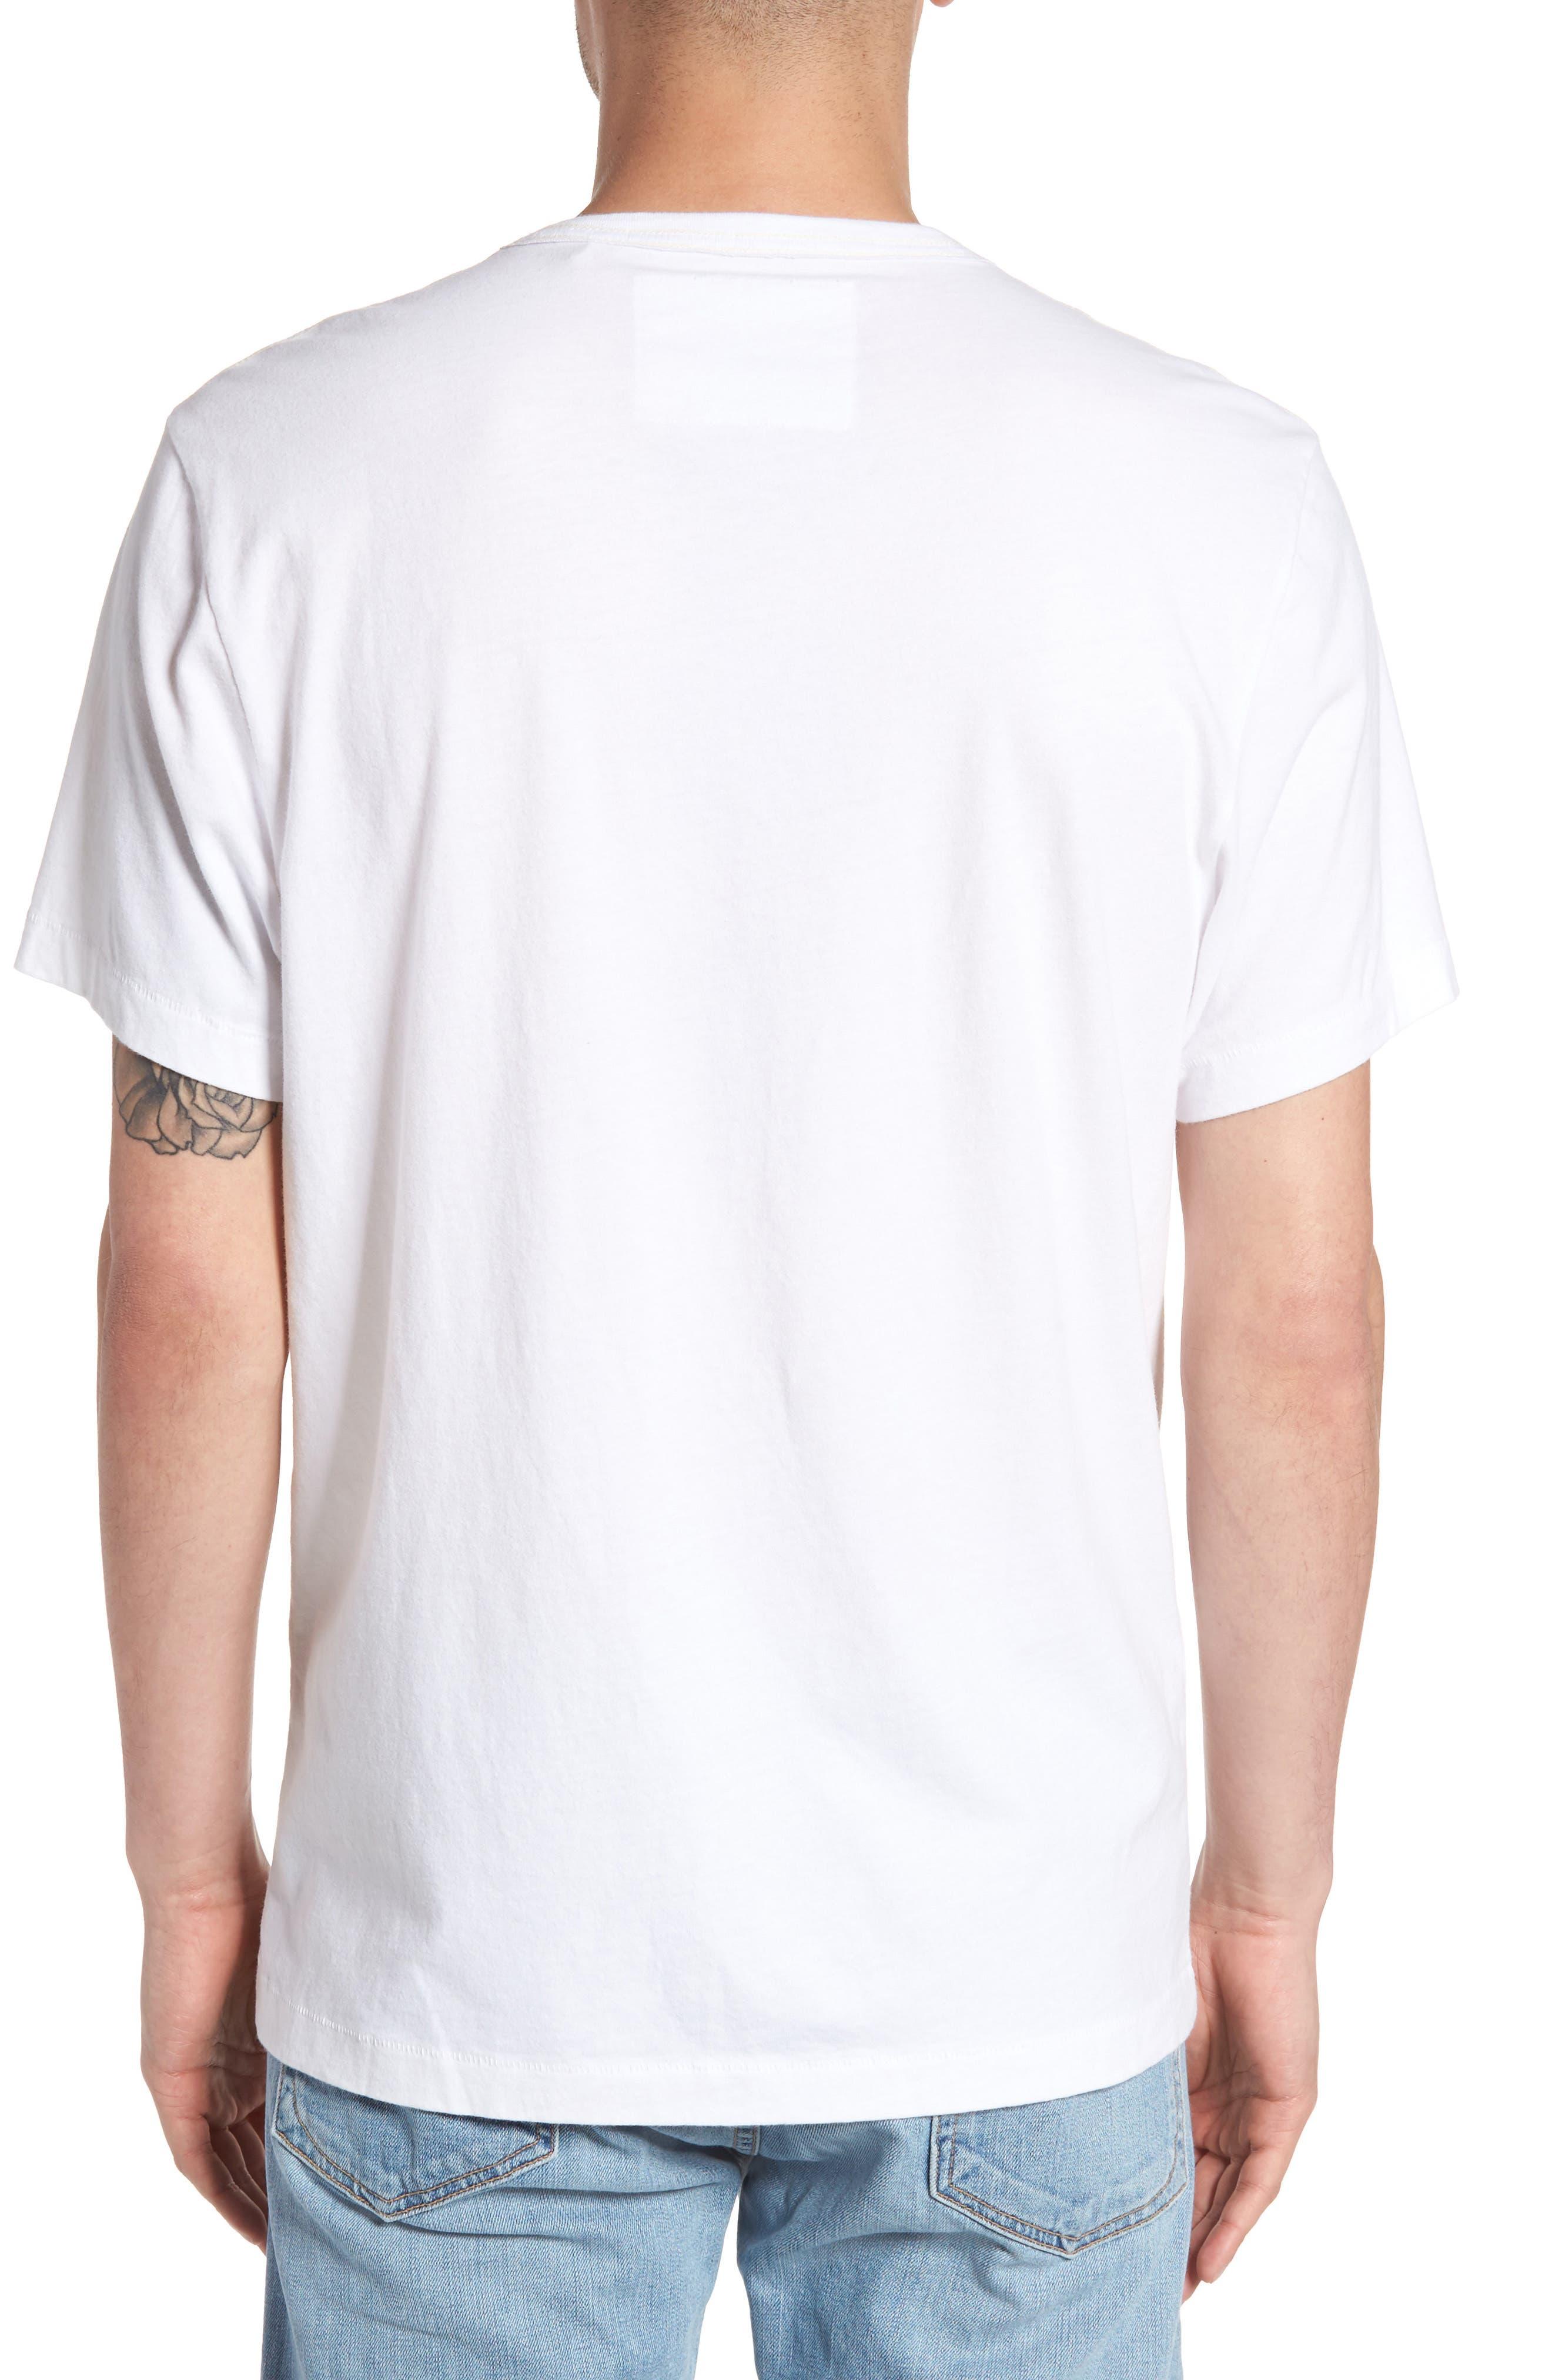 Copyright Graphic T-Shirt,                             Alternate thumbnail 2, color,                             101